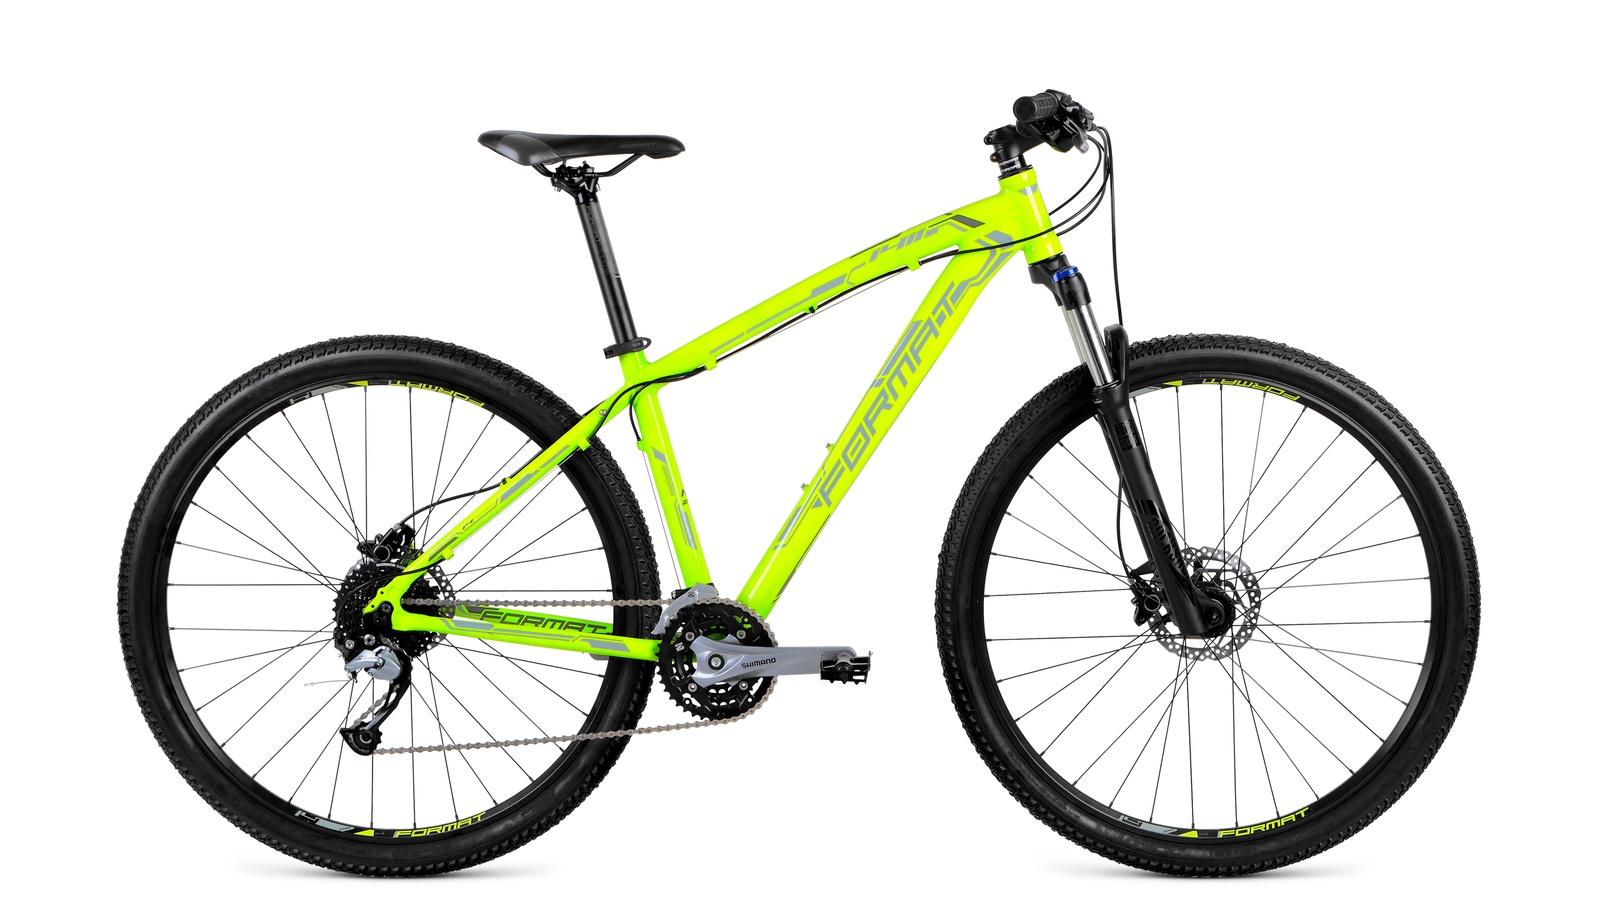 Велосипед Format RBKM9M69S007, желтый велосипед format 1113 2014